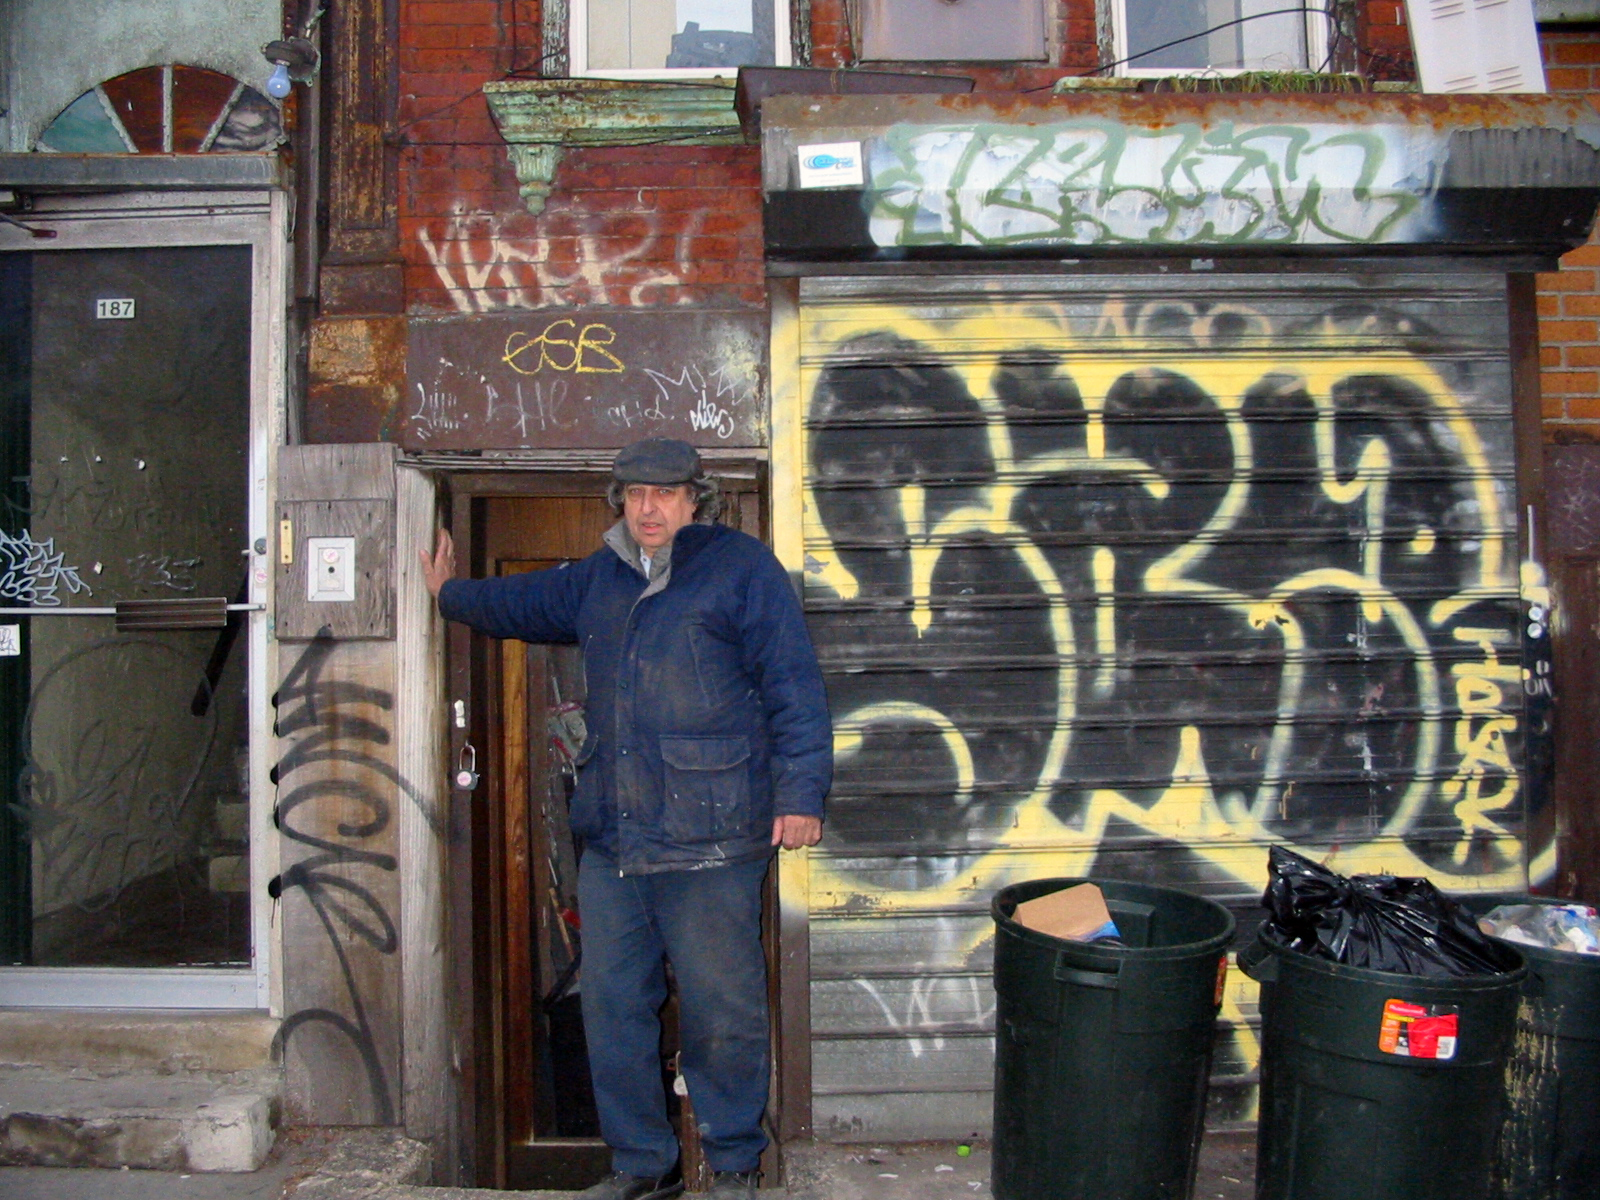 Chrystie Street, New York City